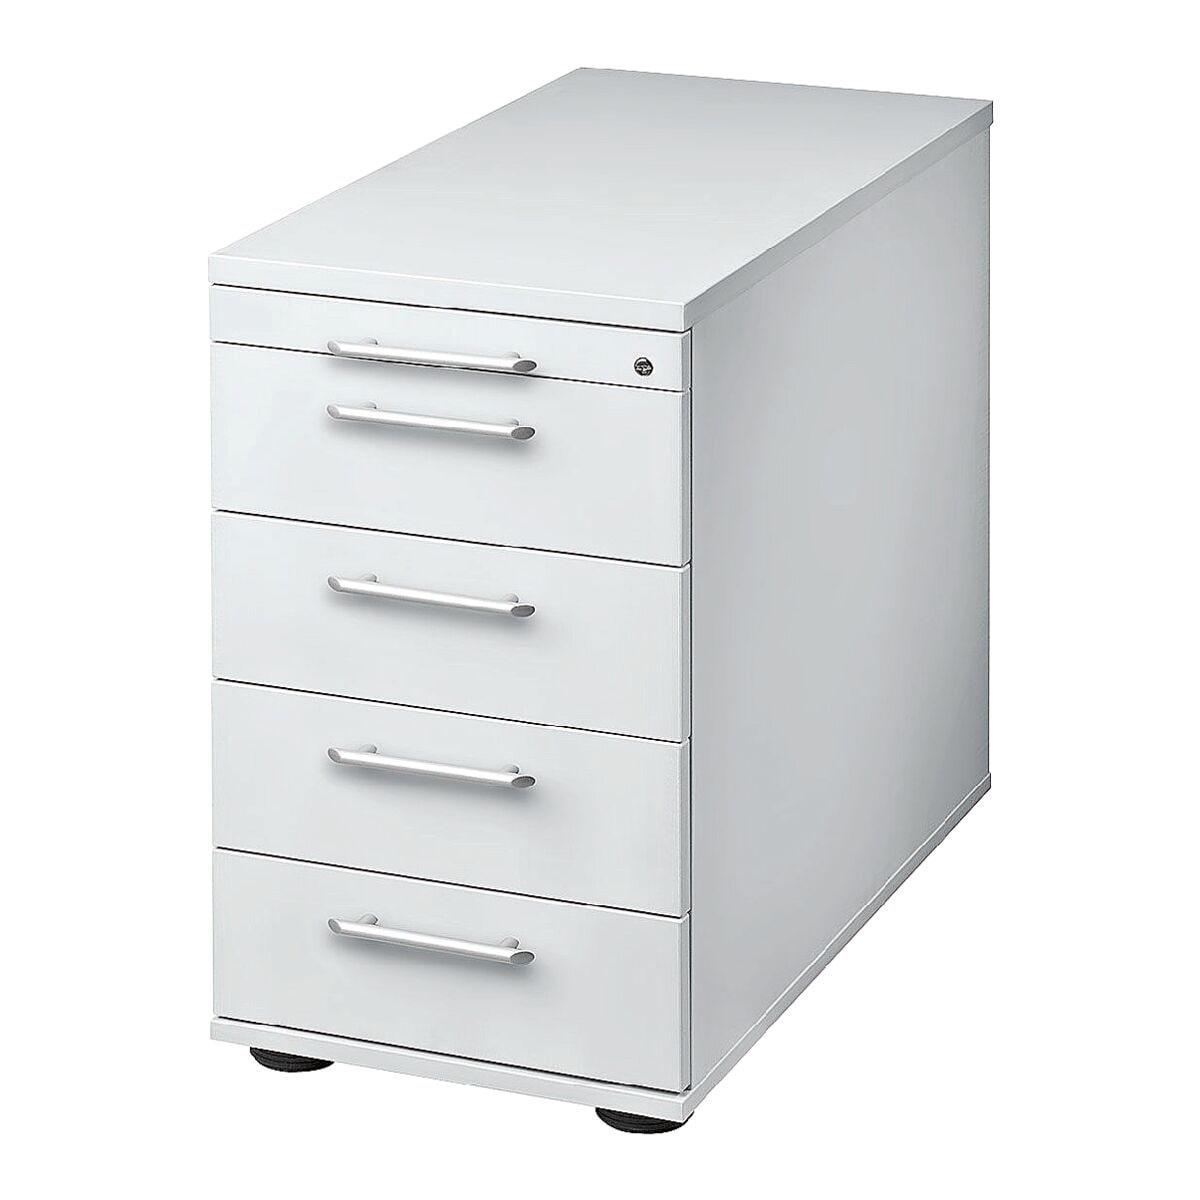 otto office premium standcontainer otto office line ii bei otto office g nstig kaufen. Black Bedroom Furniture Sets. Home Design Ideas